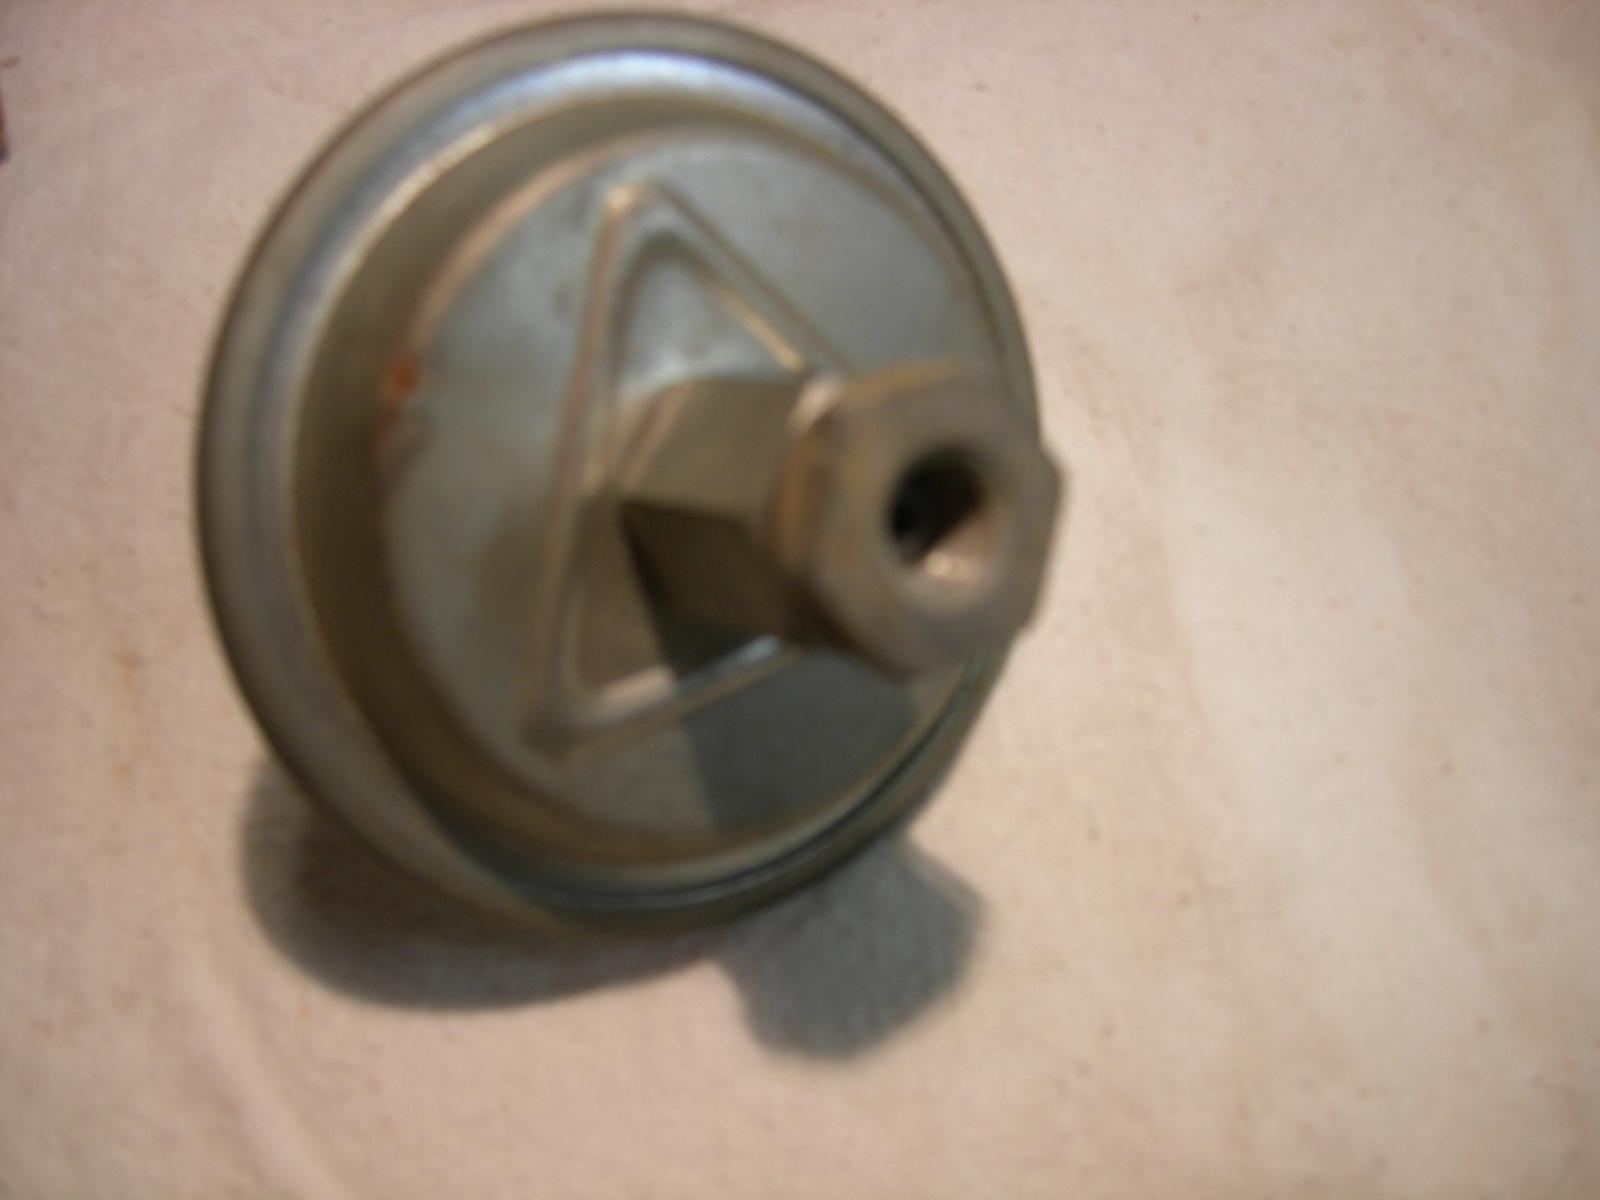 NOS 1948 1949 1950 1951 1952 1953 1954 1955 Nash 6 Cyl Vacuum Advance 1924505 (a1924505)